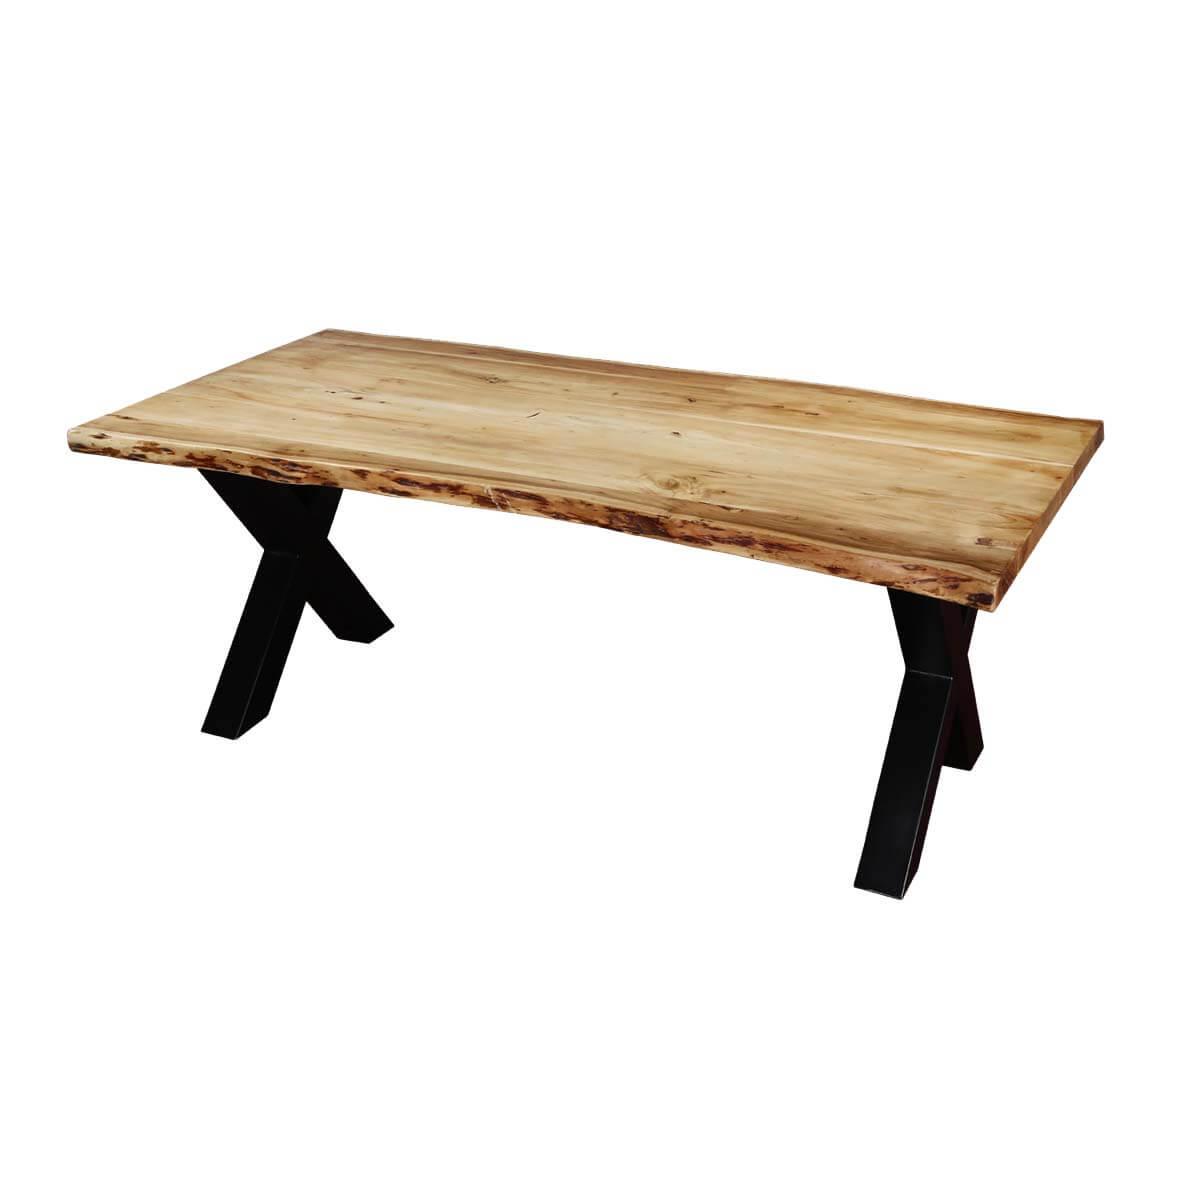 Industrial 78 cross legs acacia wood live edge dining table